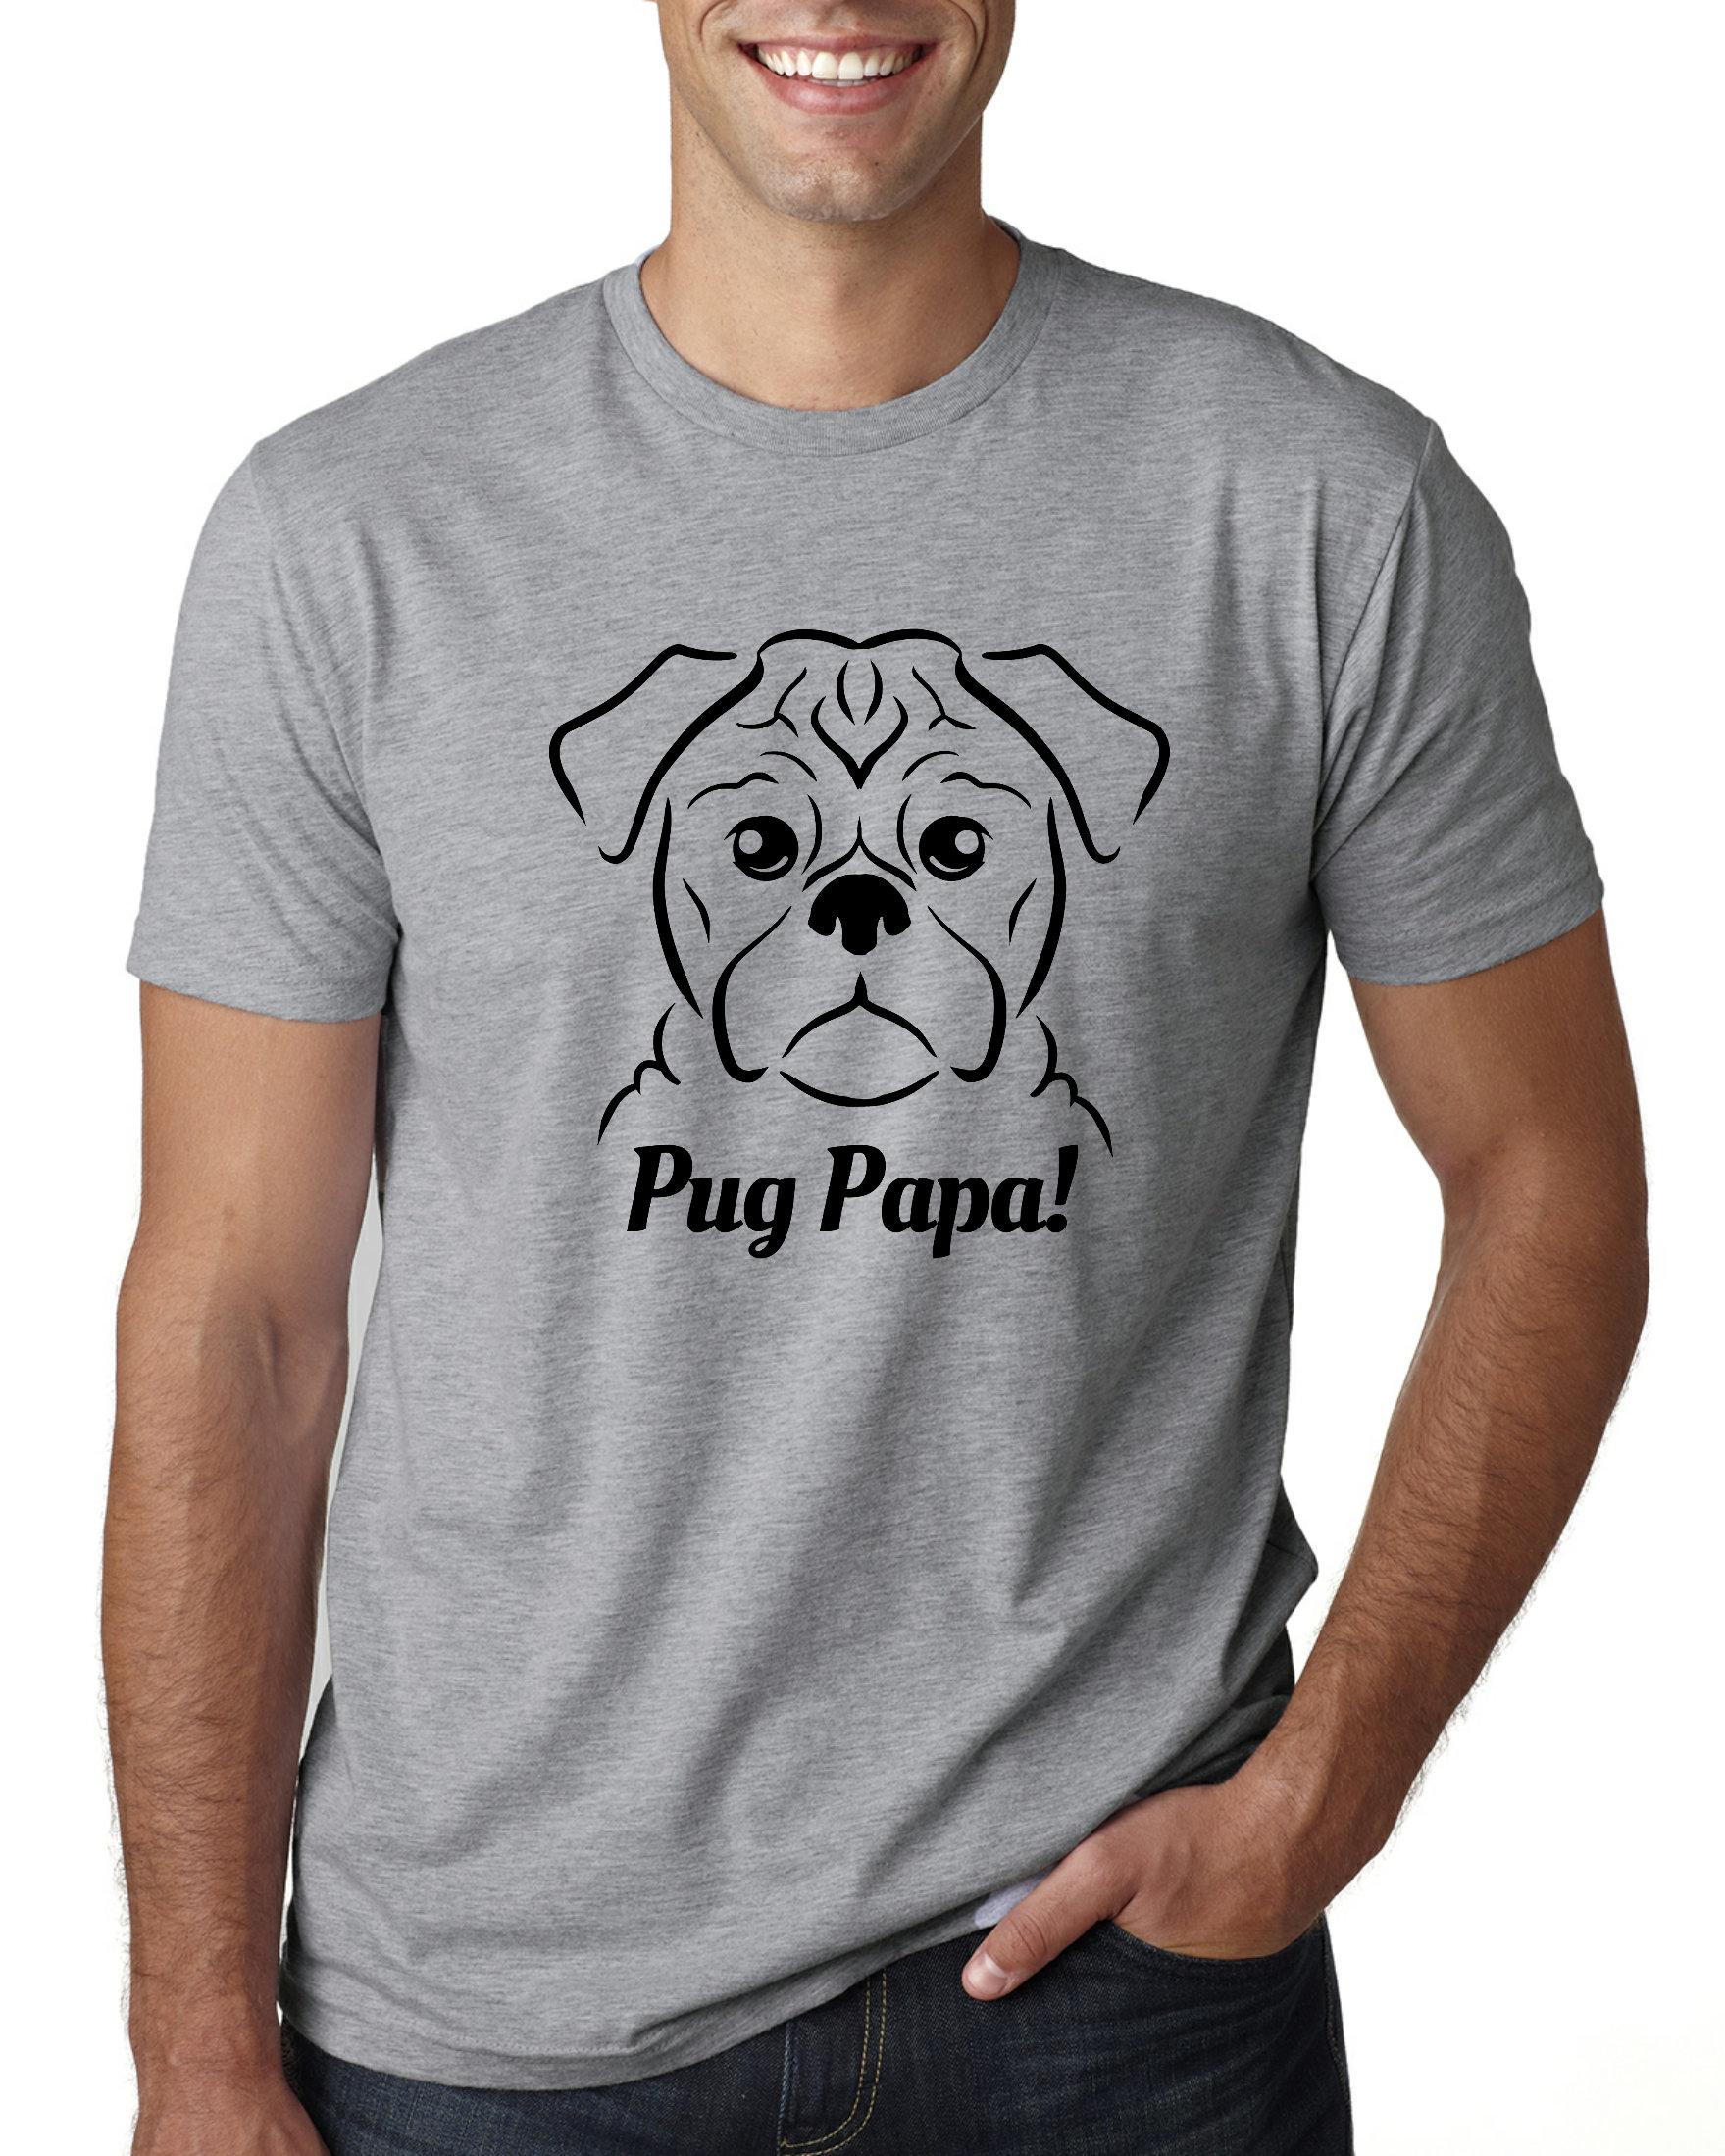 5723ebc3 Pug Papa T-Shirt Pug Dad Shirt Pug Dad T-Shirt Pug T-Shirt | Etsy